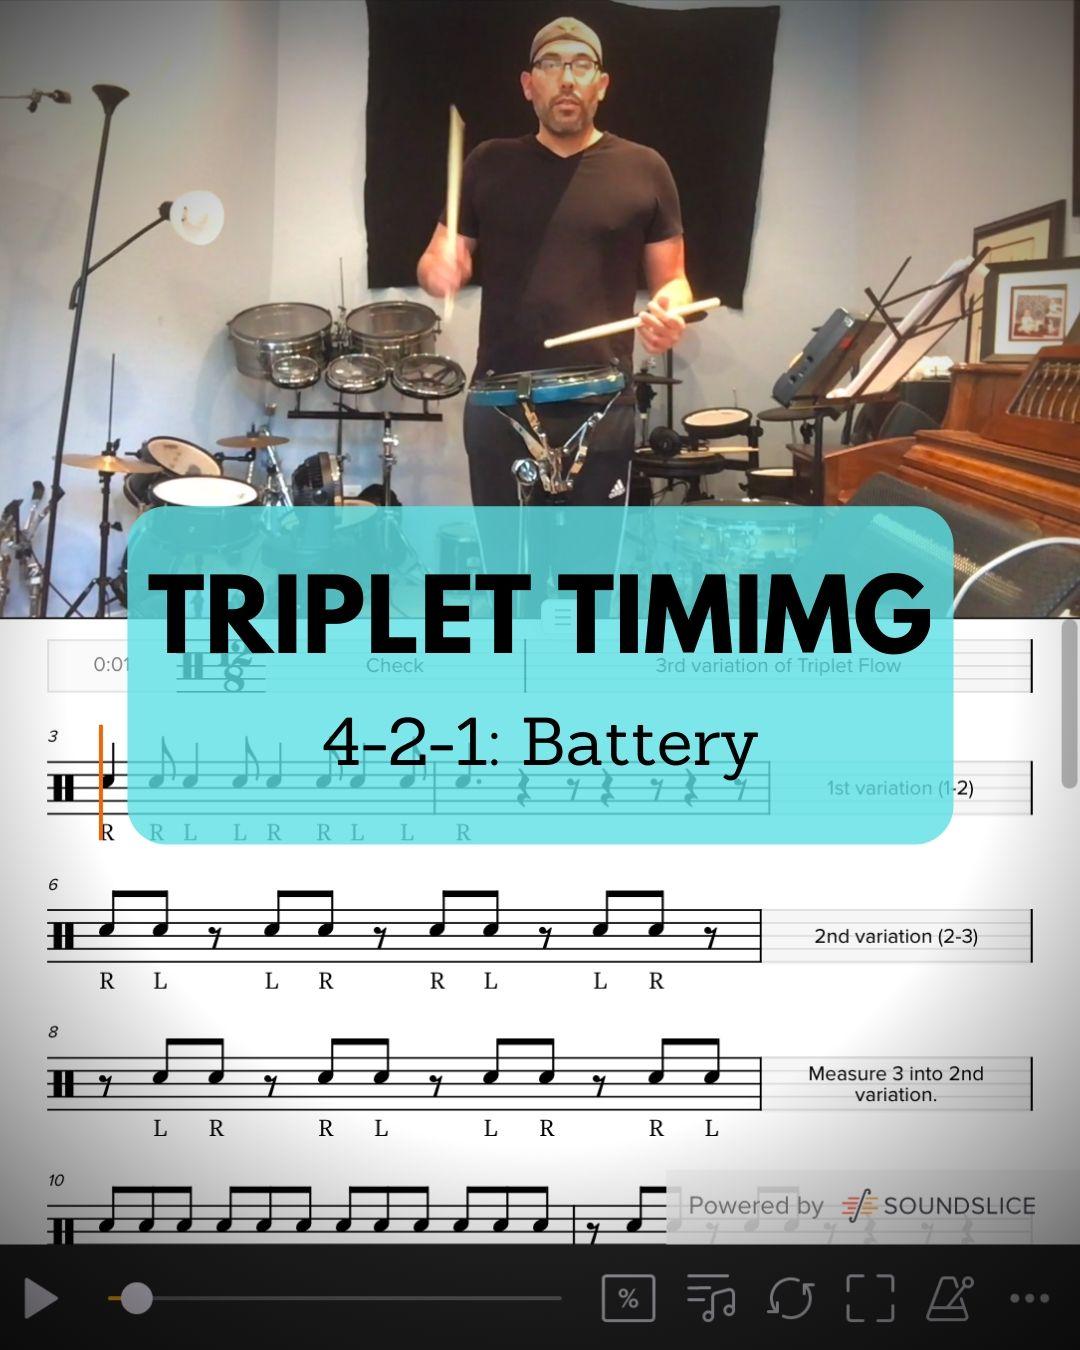 Triplet Timing